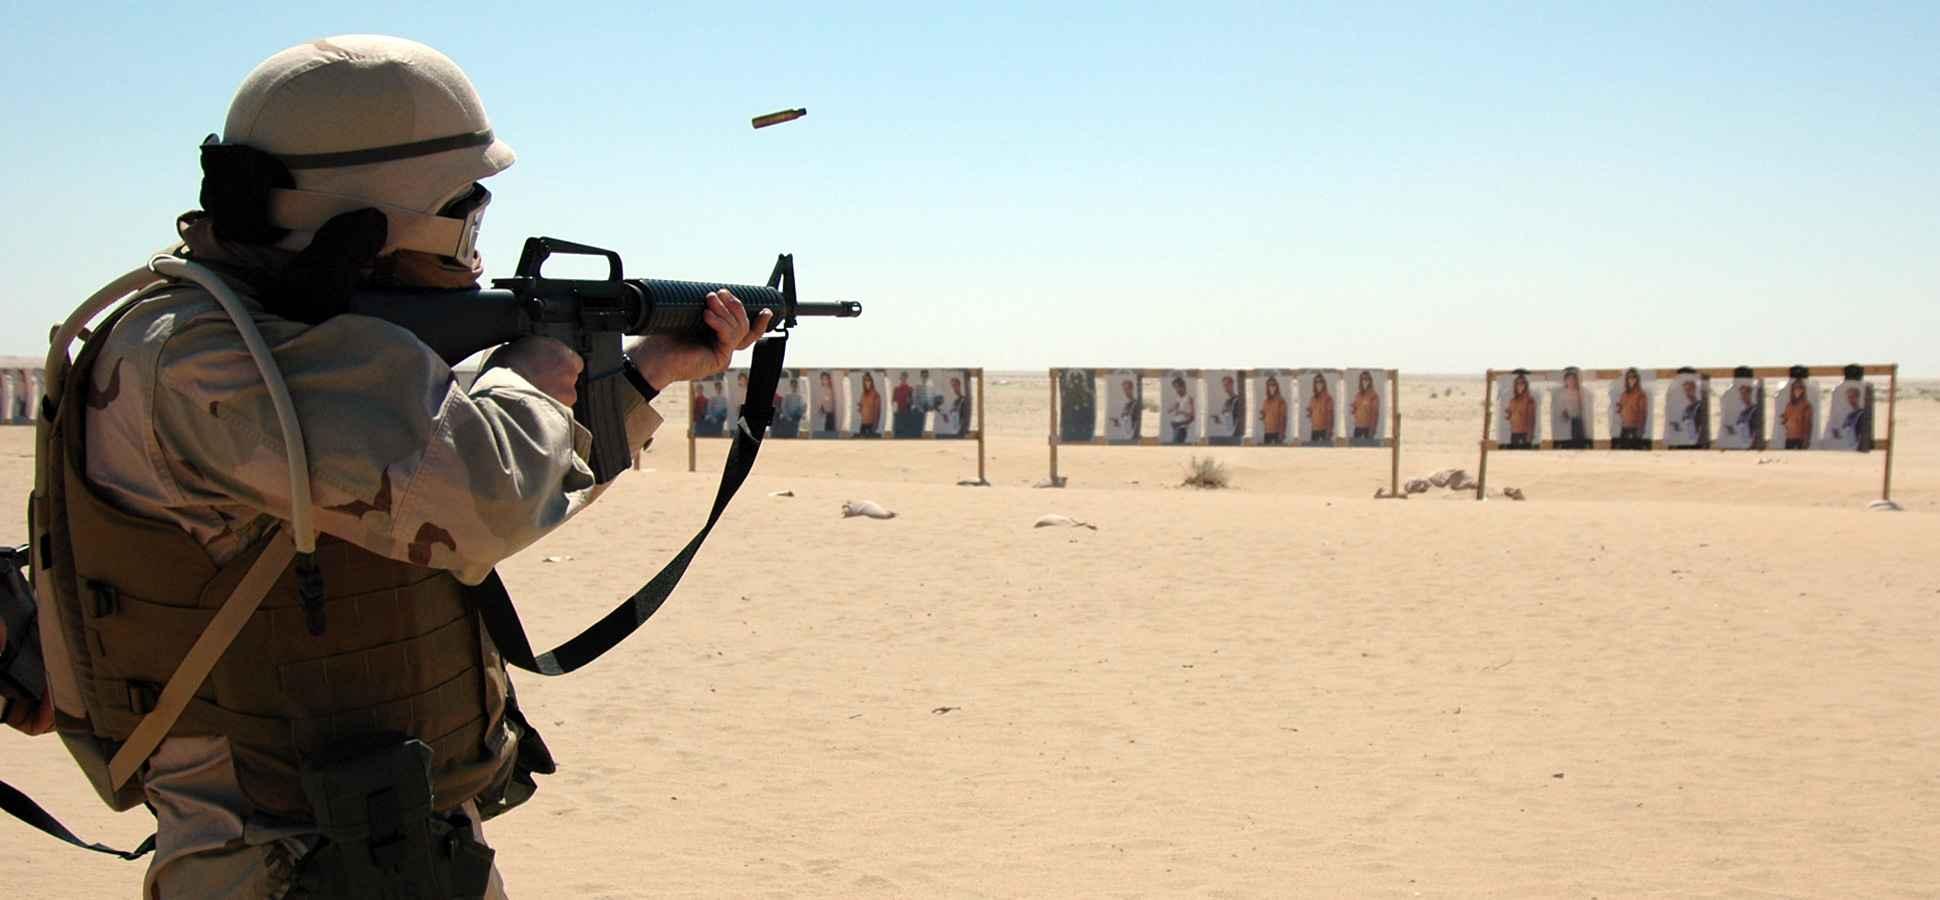 The 7 Secret Habits of Navy SEALs